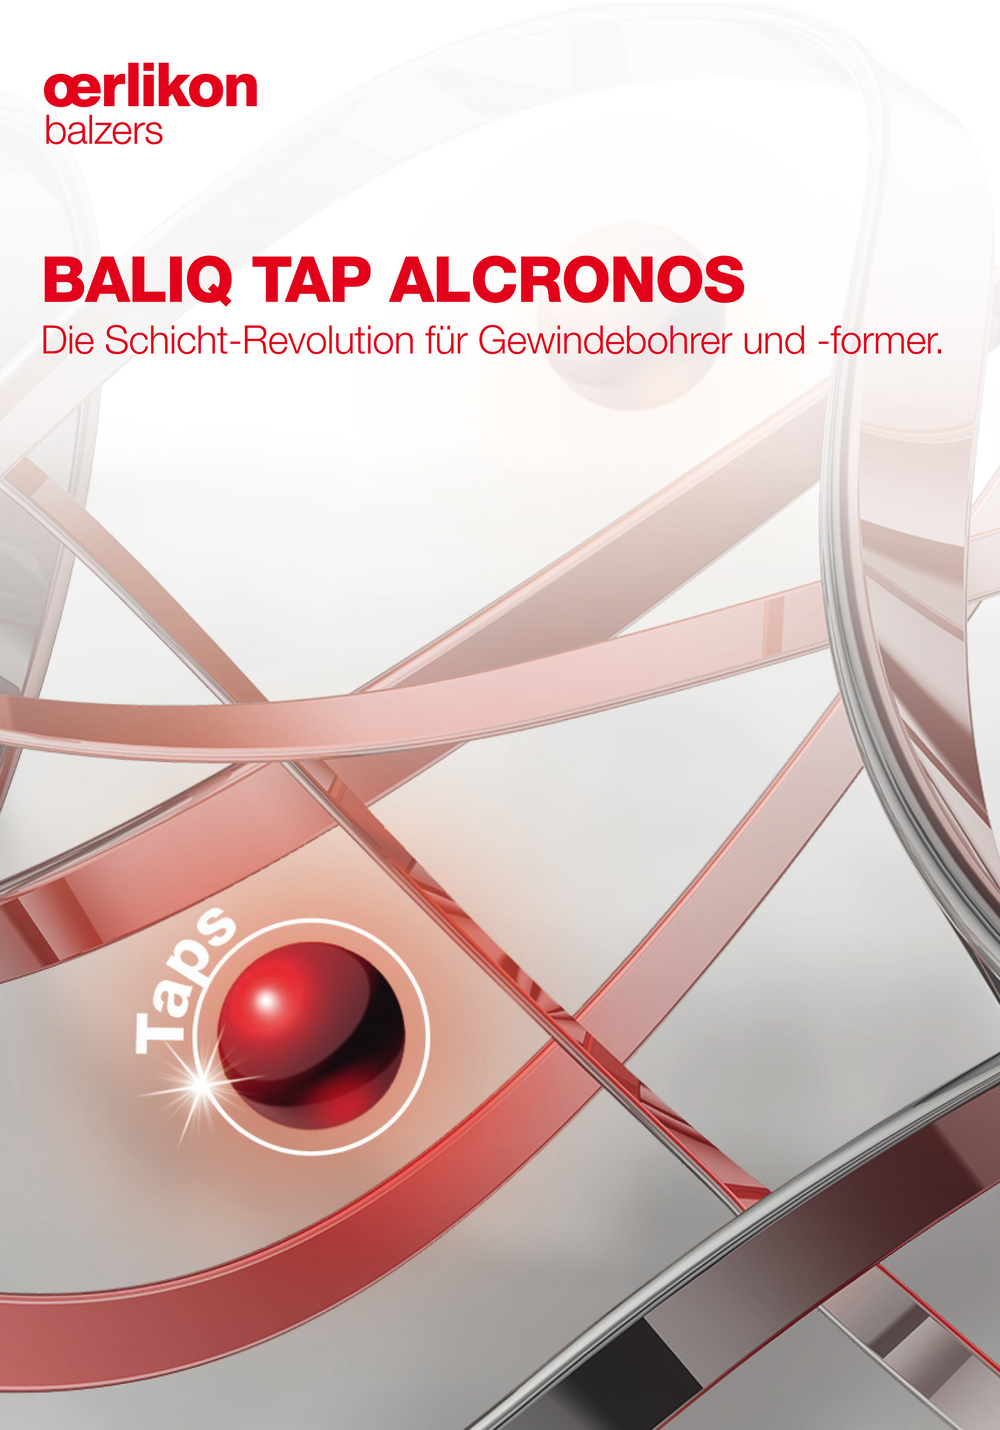 Broschüre Oerlikon Balzers - BALIQ Tap Alcronos 1